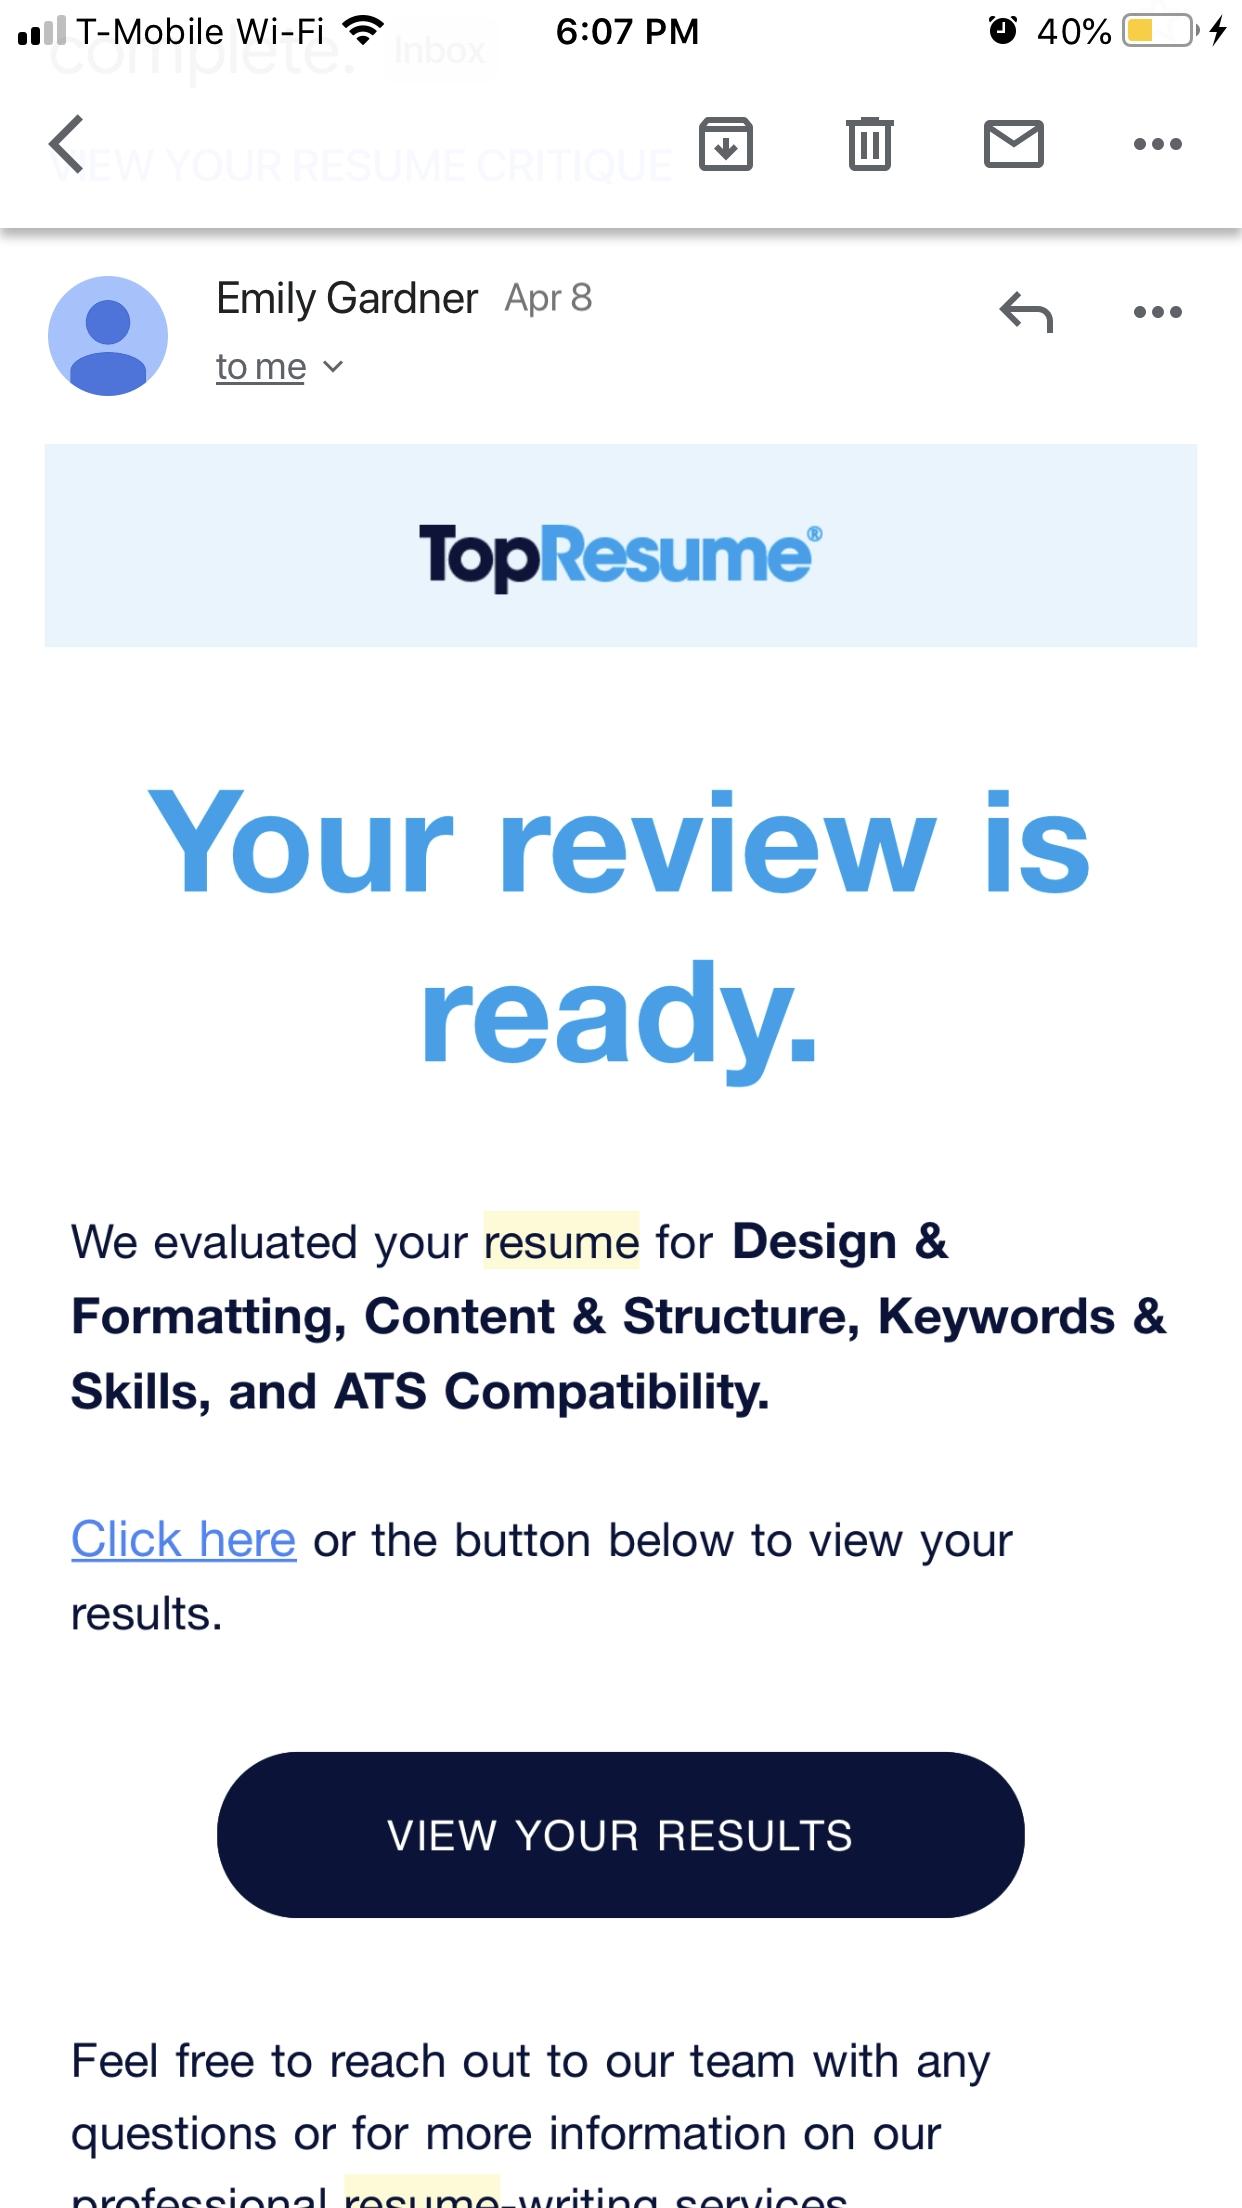 topresume reviews